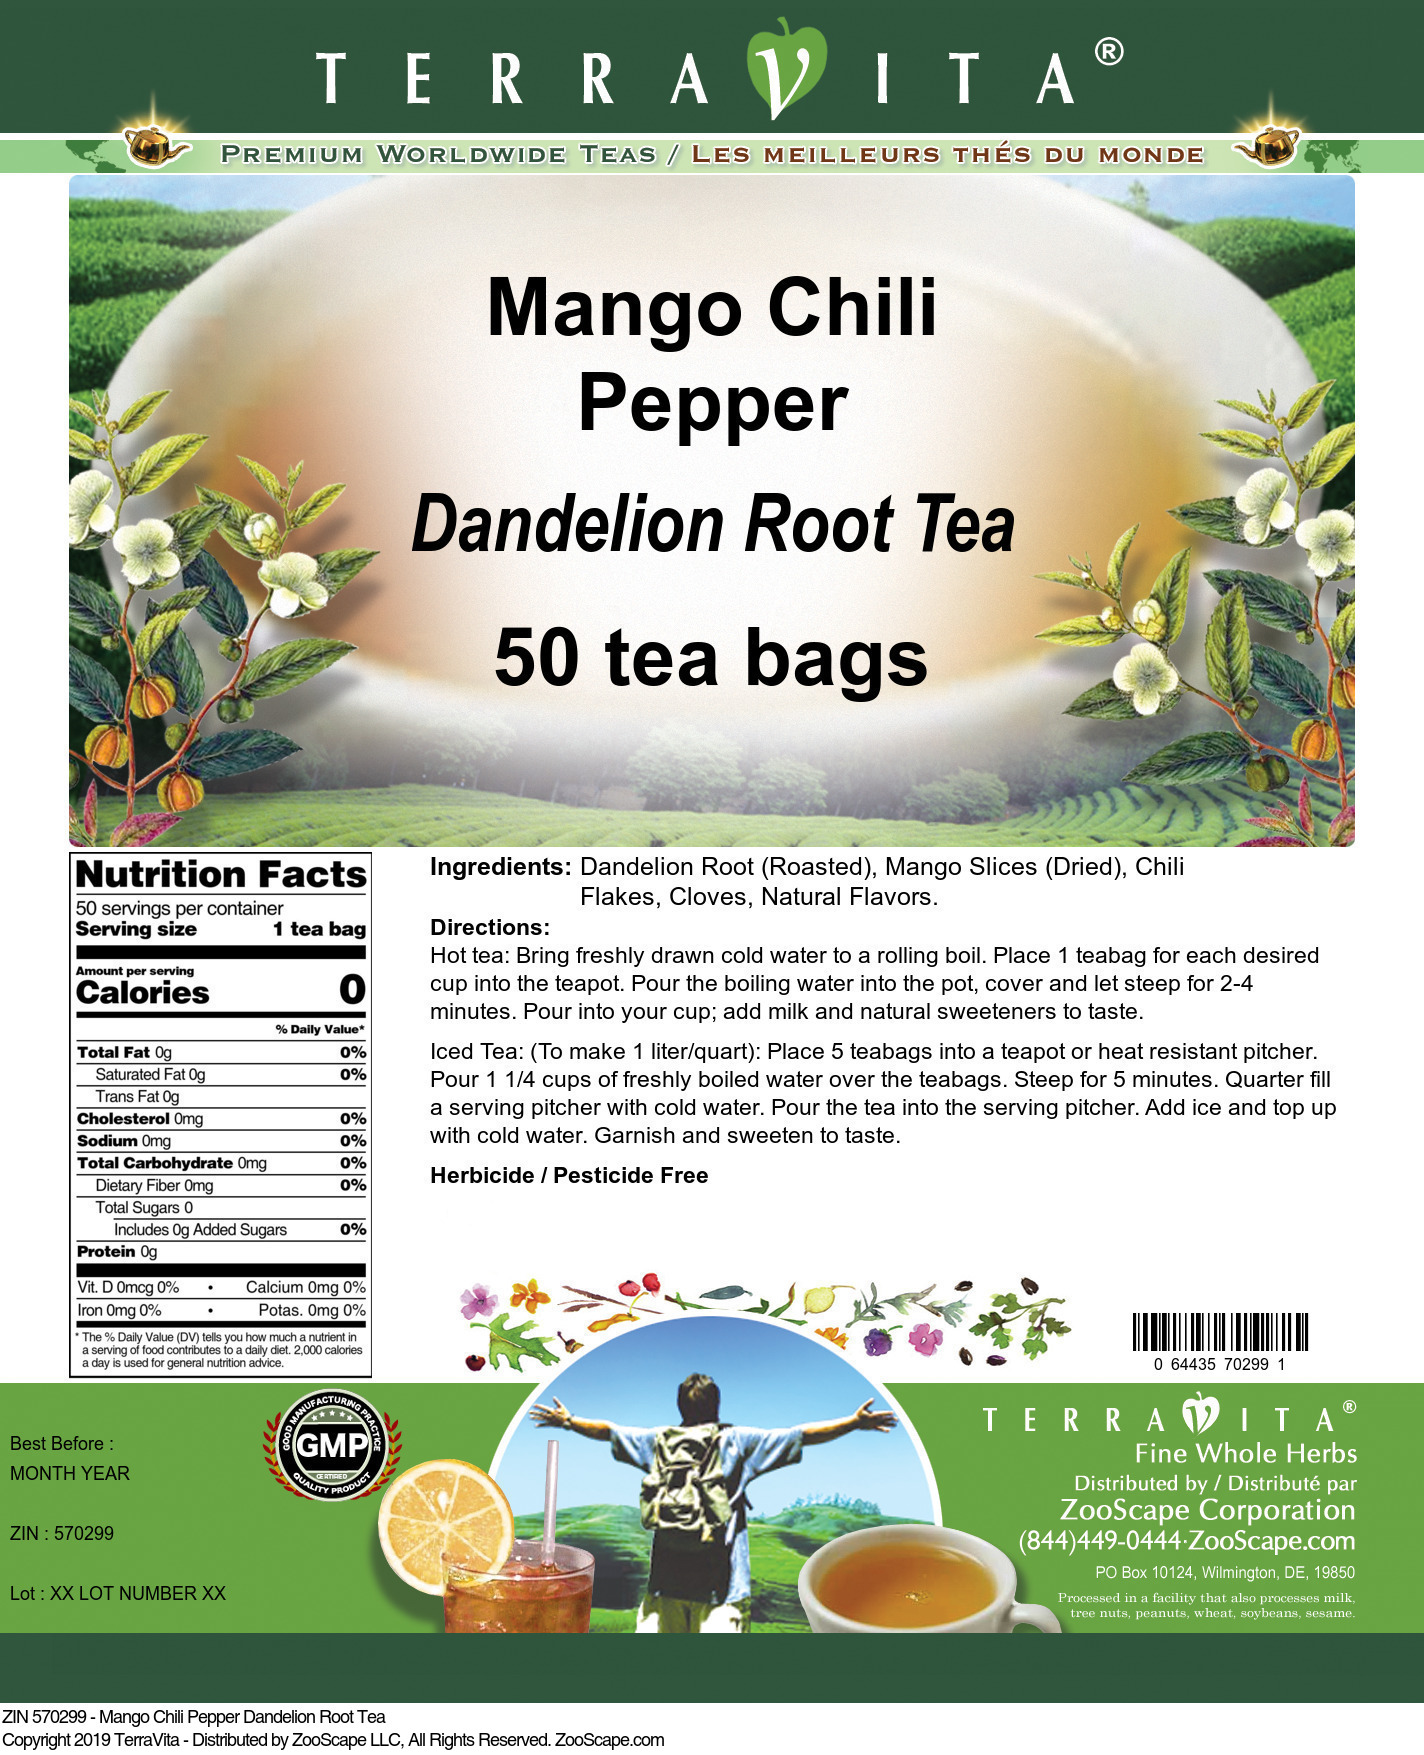 Mango Chili Pepper Dandelion Root Tea